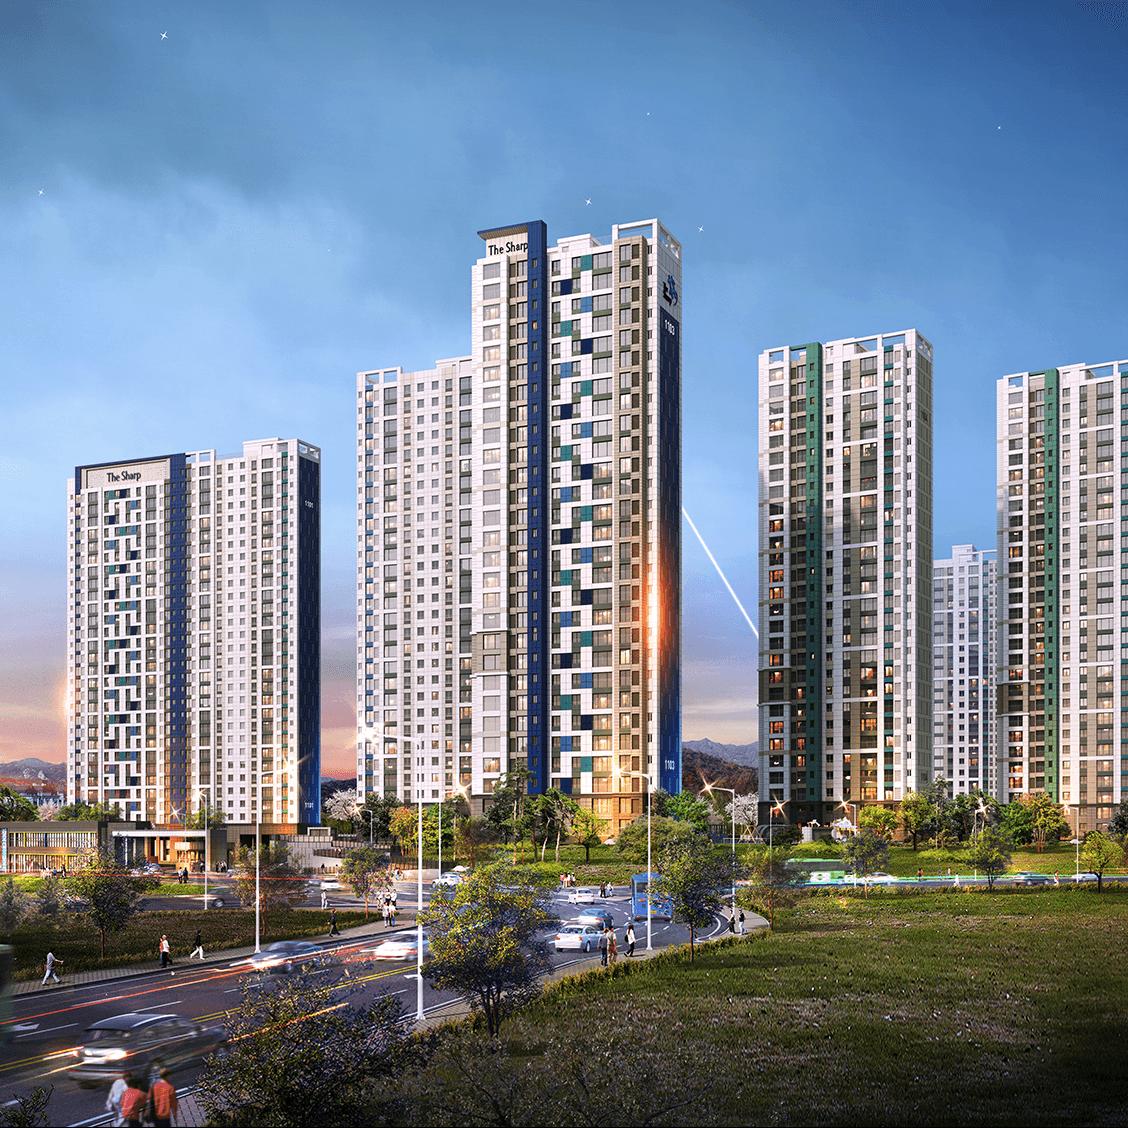 Eco-City The Sharp 3rd 2016